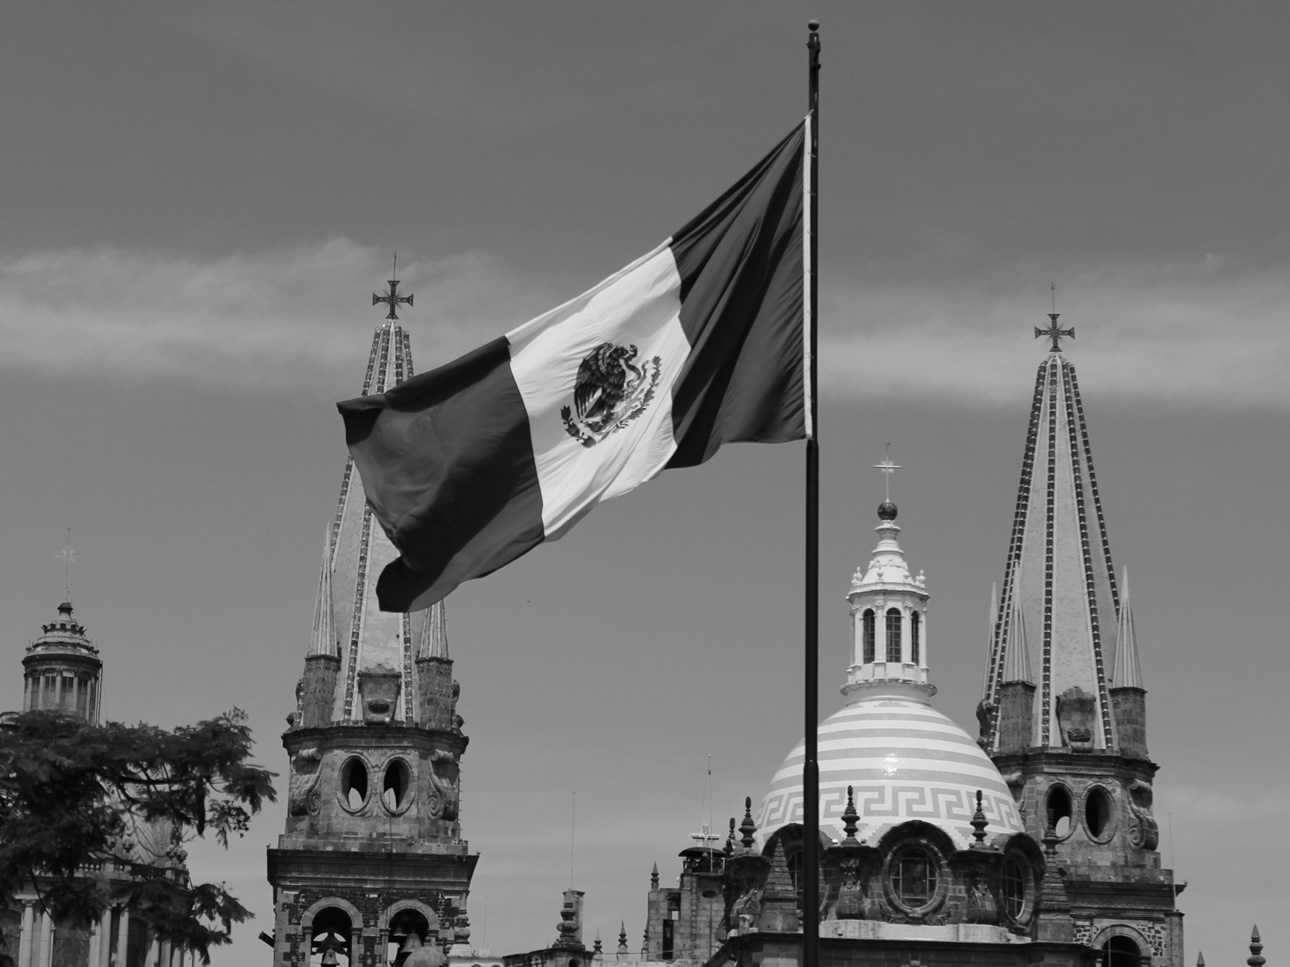 Viesca, E. (2014). [Bandera mexicana, Plaza Liberación, Guadalajara, Jalisco]. Recuperado a partir de http://archive.org/details/gdl2014